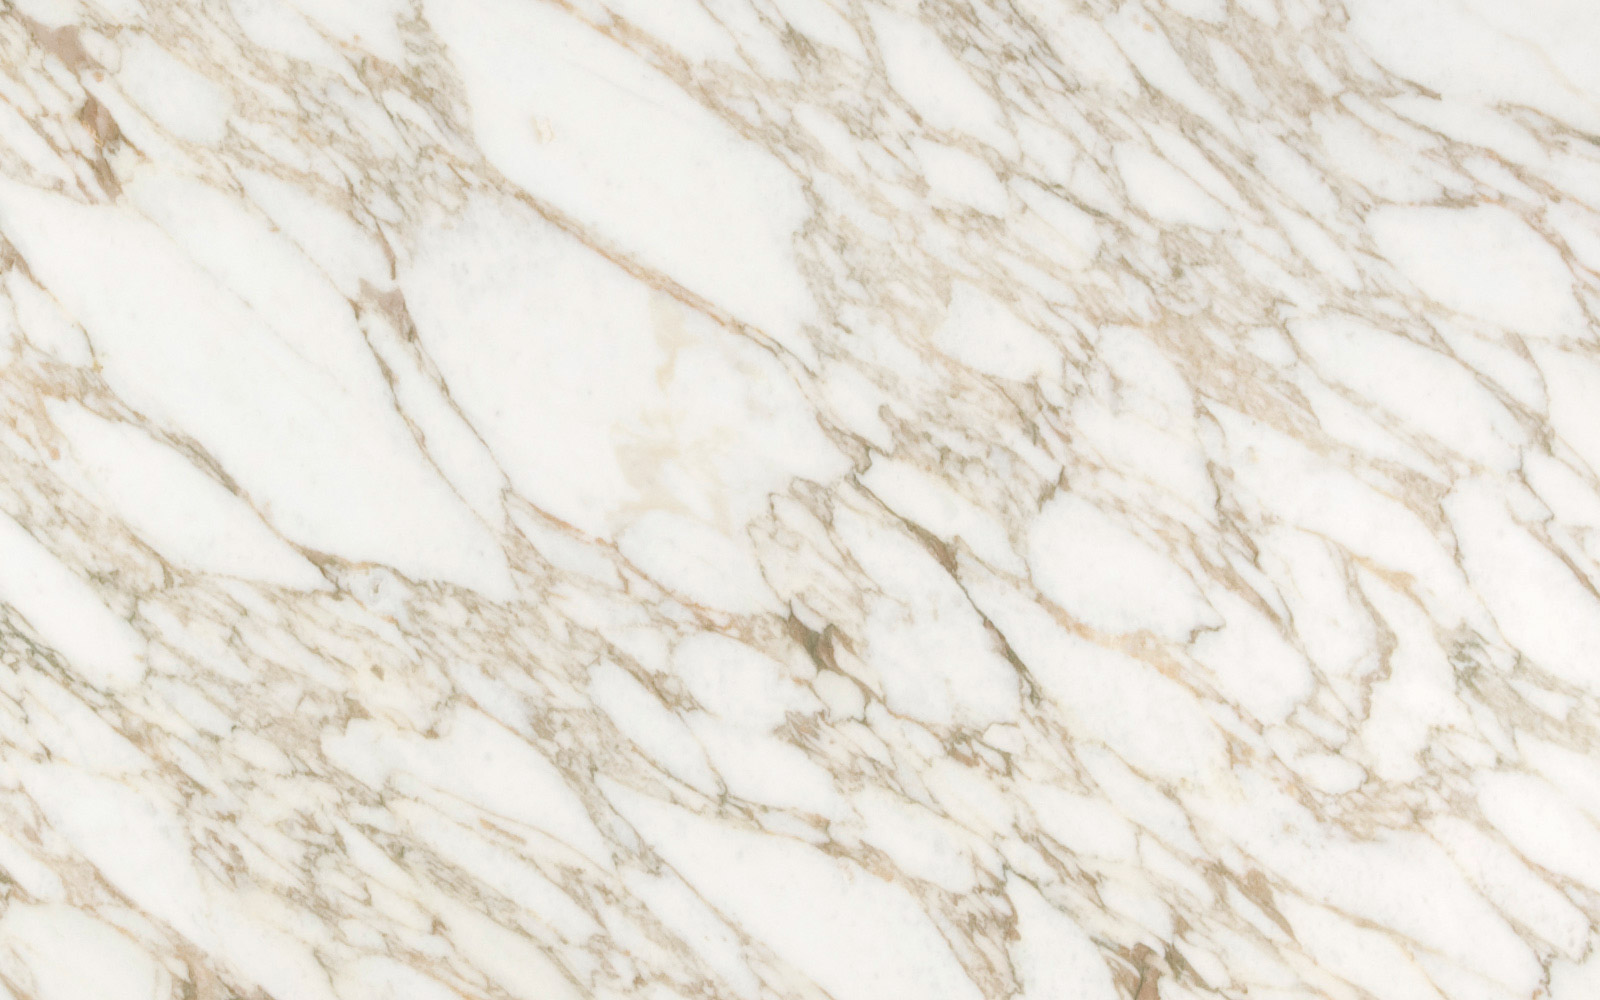 Calacatta Vagli Marble - Italian Marble - Byblos Stone